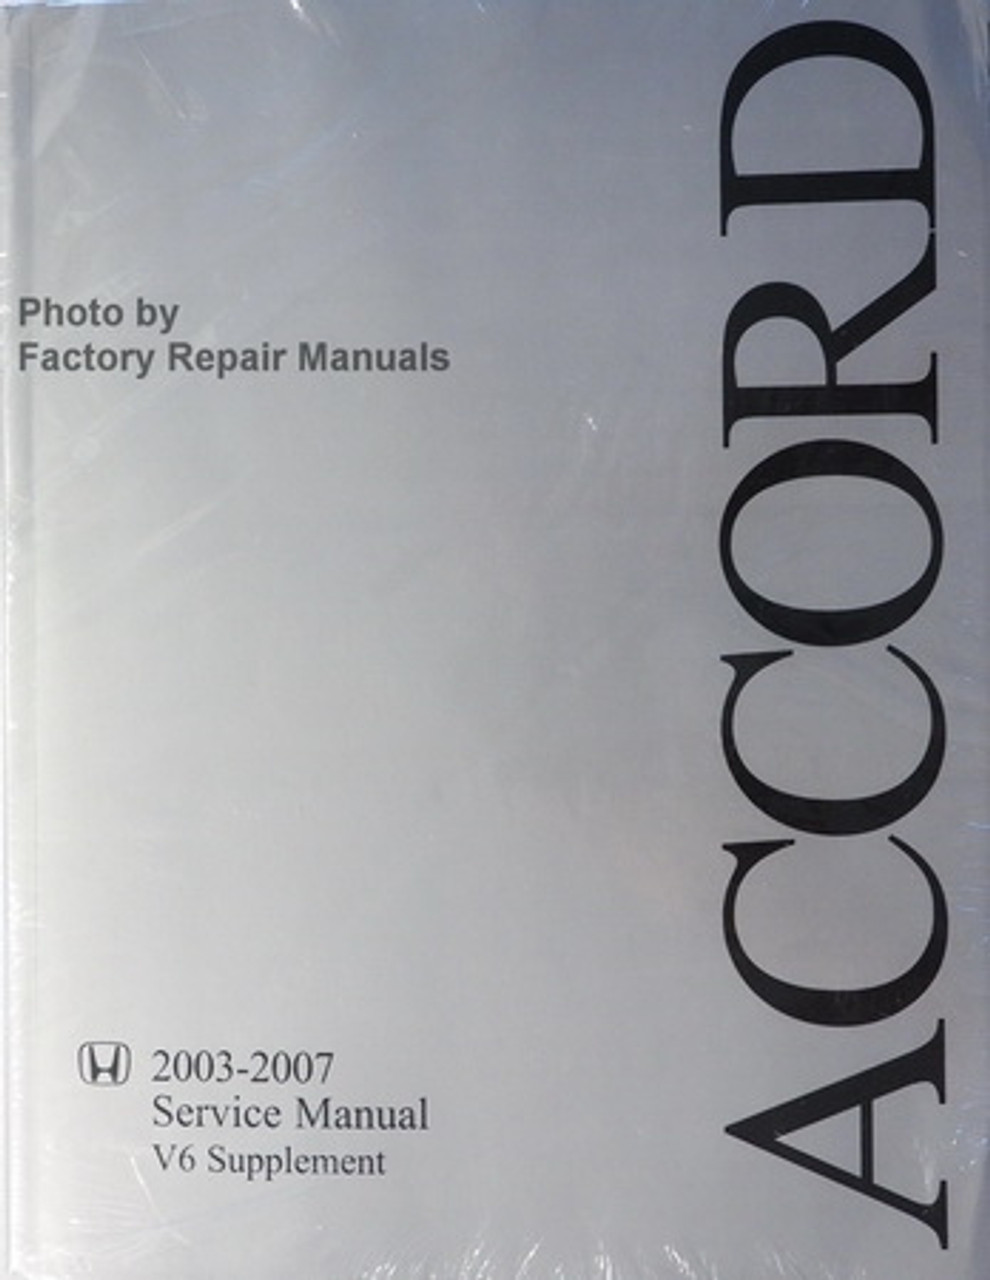 2003 2007 Honda Accord Factory Service Manual V6 Supplement Original Shop Repair Factory Repair Manuals